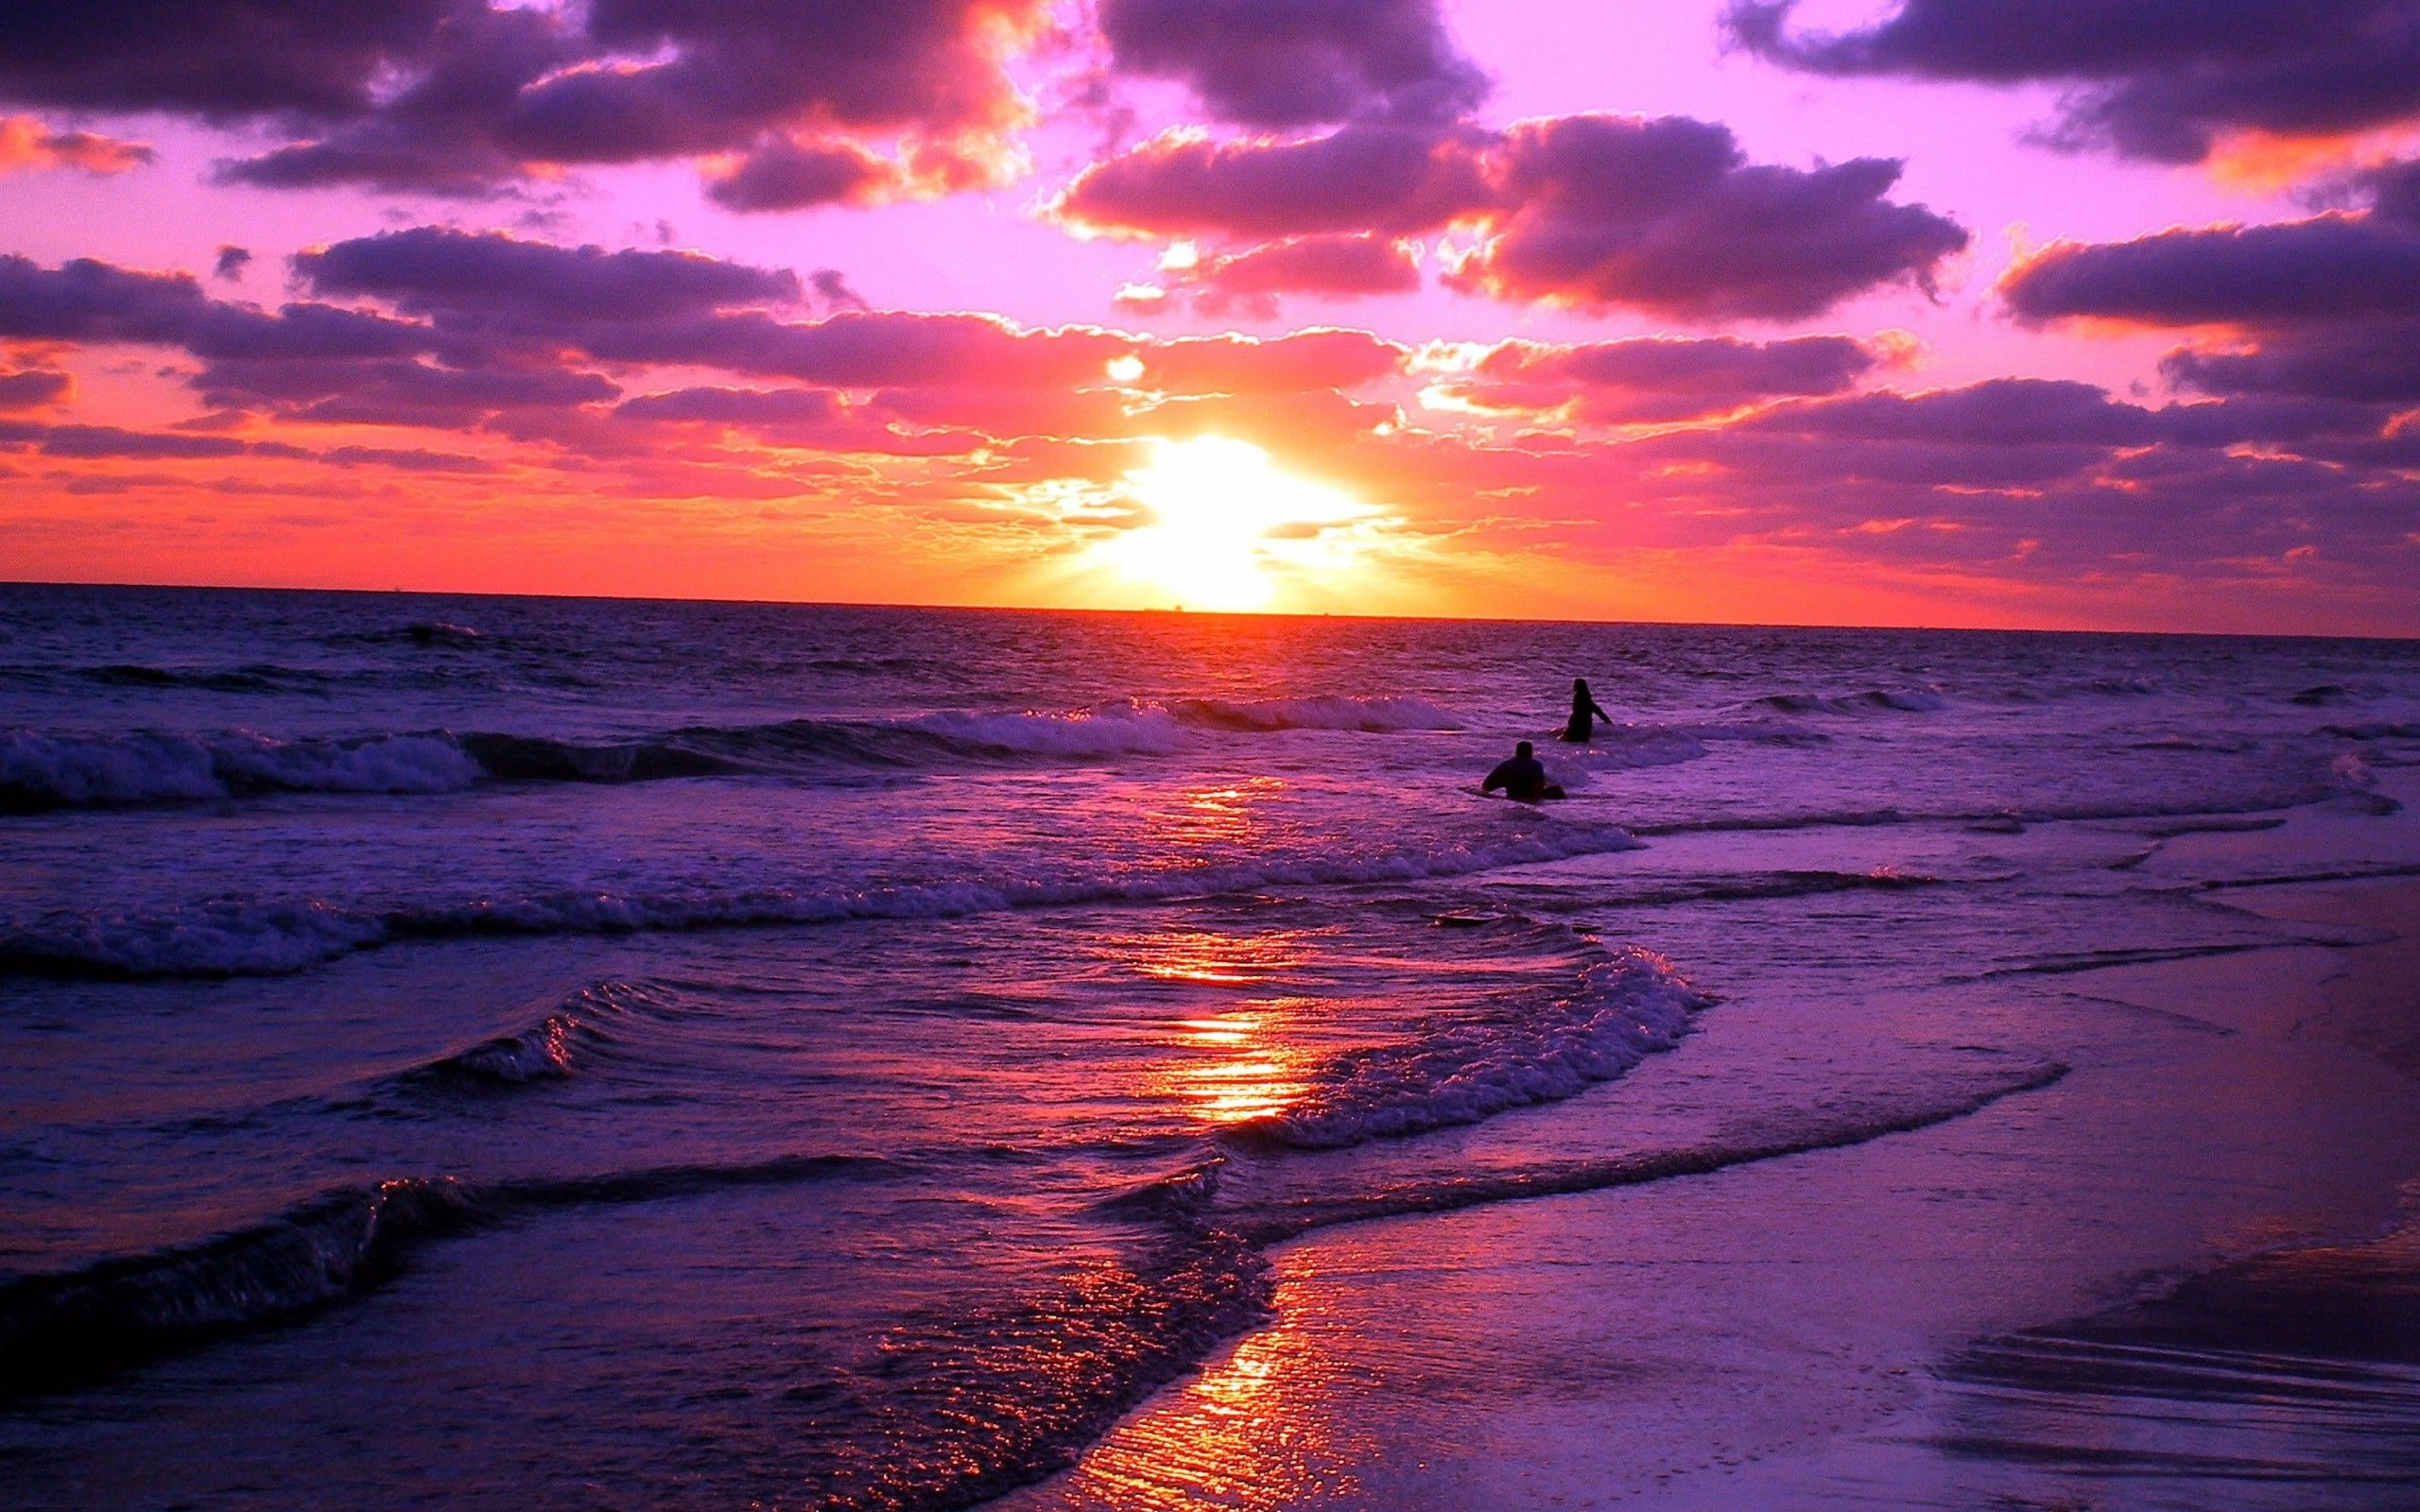 Sunset Landscape Purple Orange Waves Beach Nature Coast Sea Water Clouds Wallpaper Hd Beach Sunset Wallpaper Sunset Pictures Purple Sunset